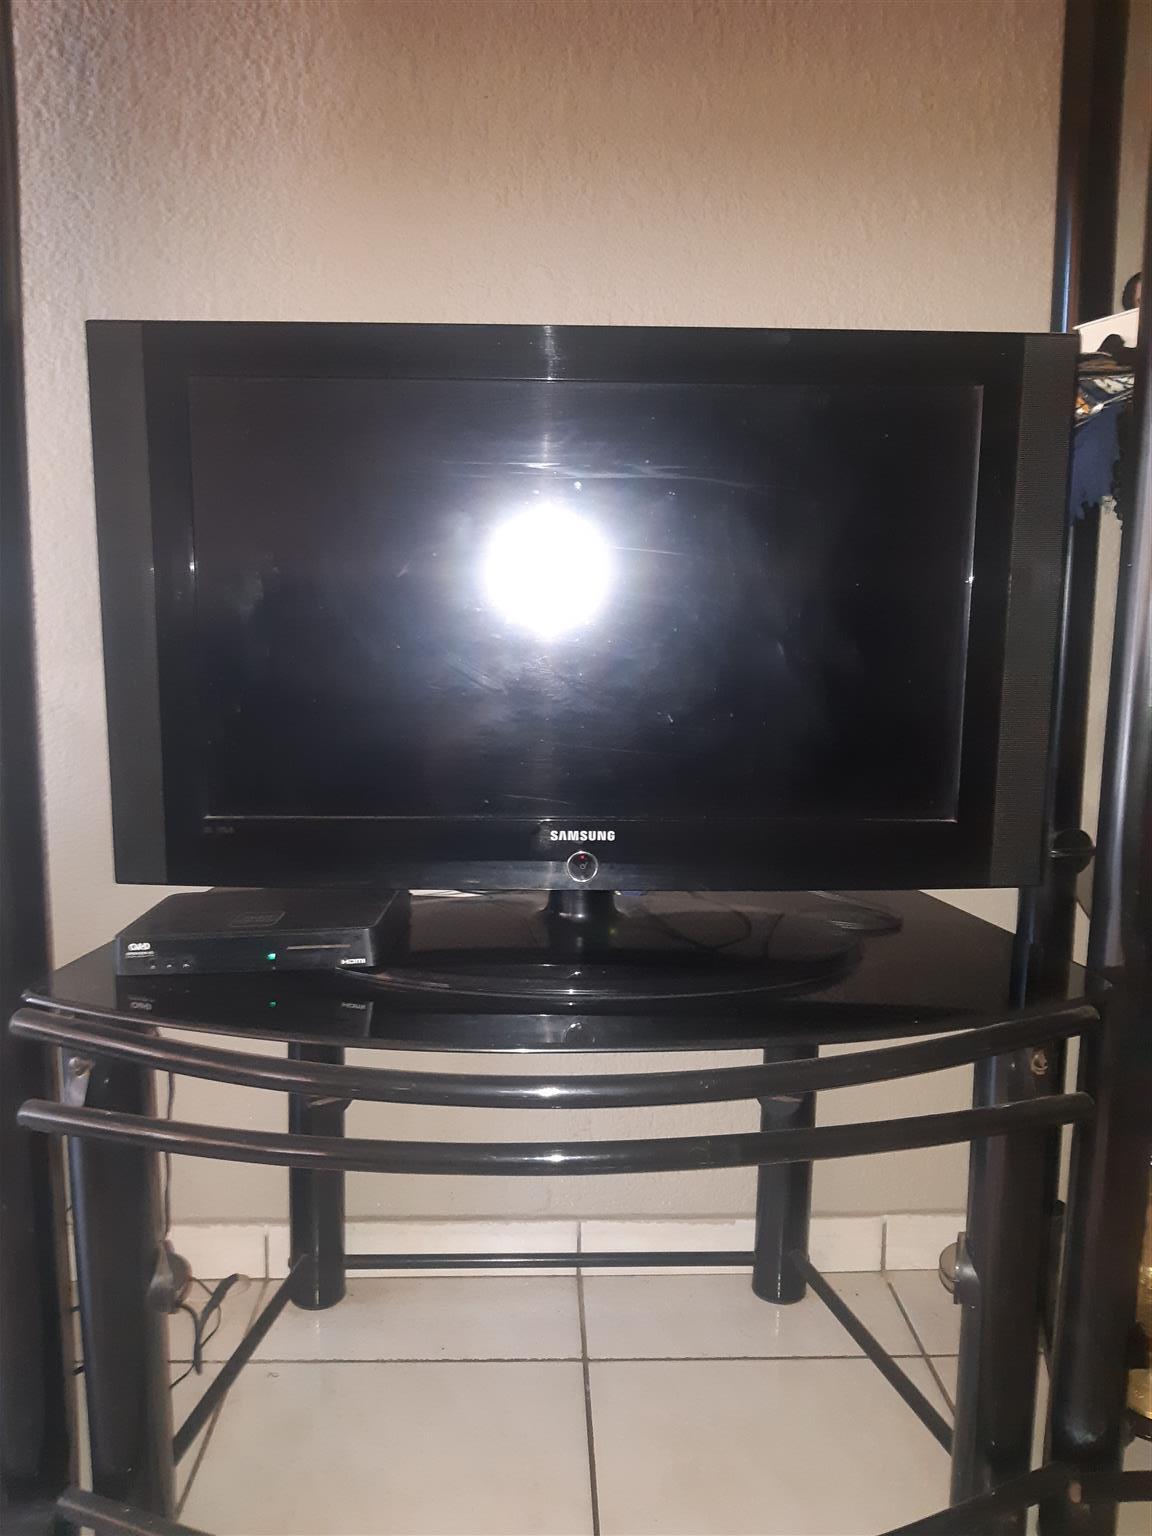 Flat screen tv Samsung